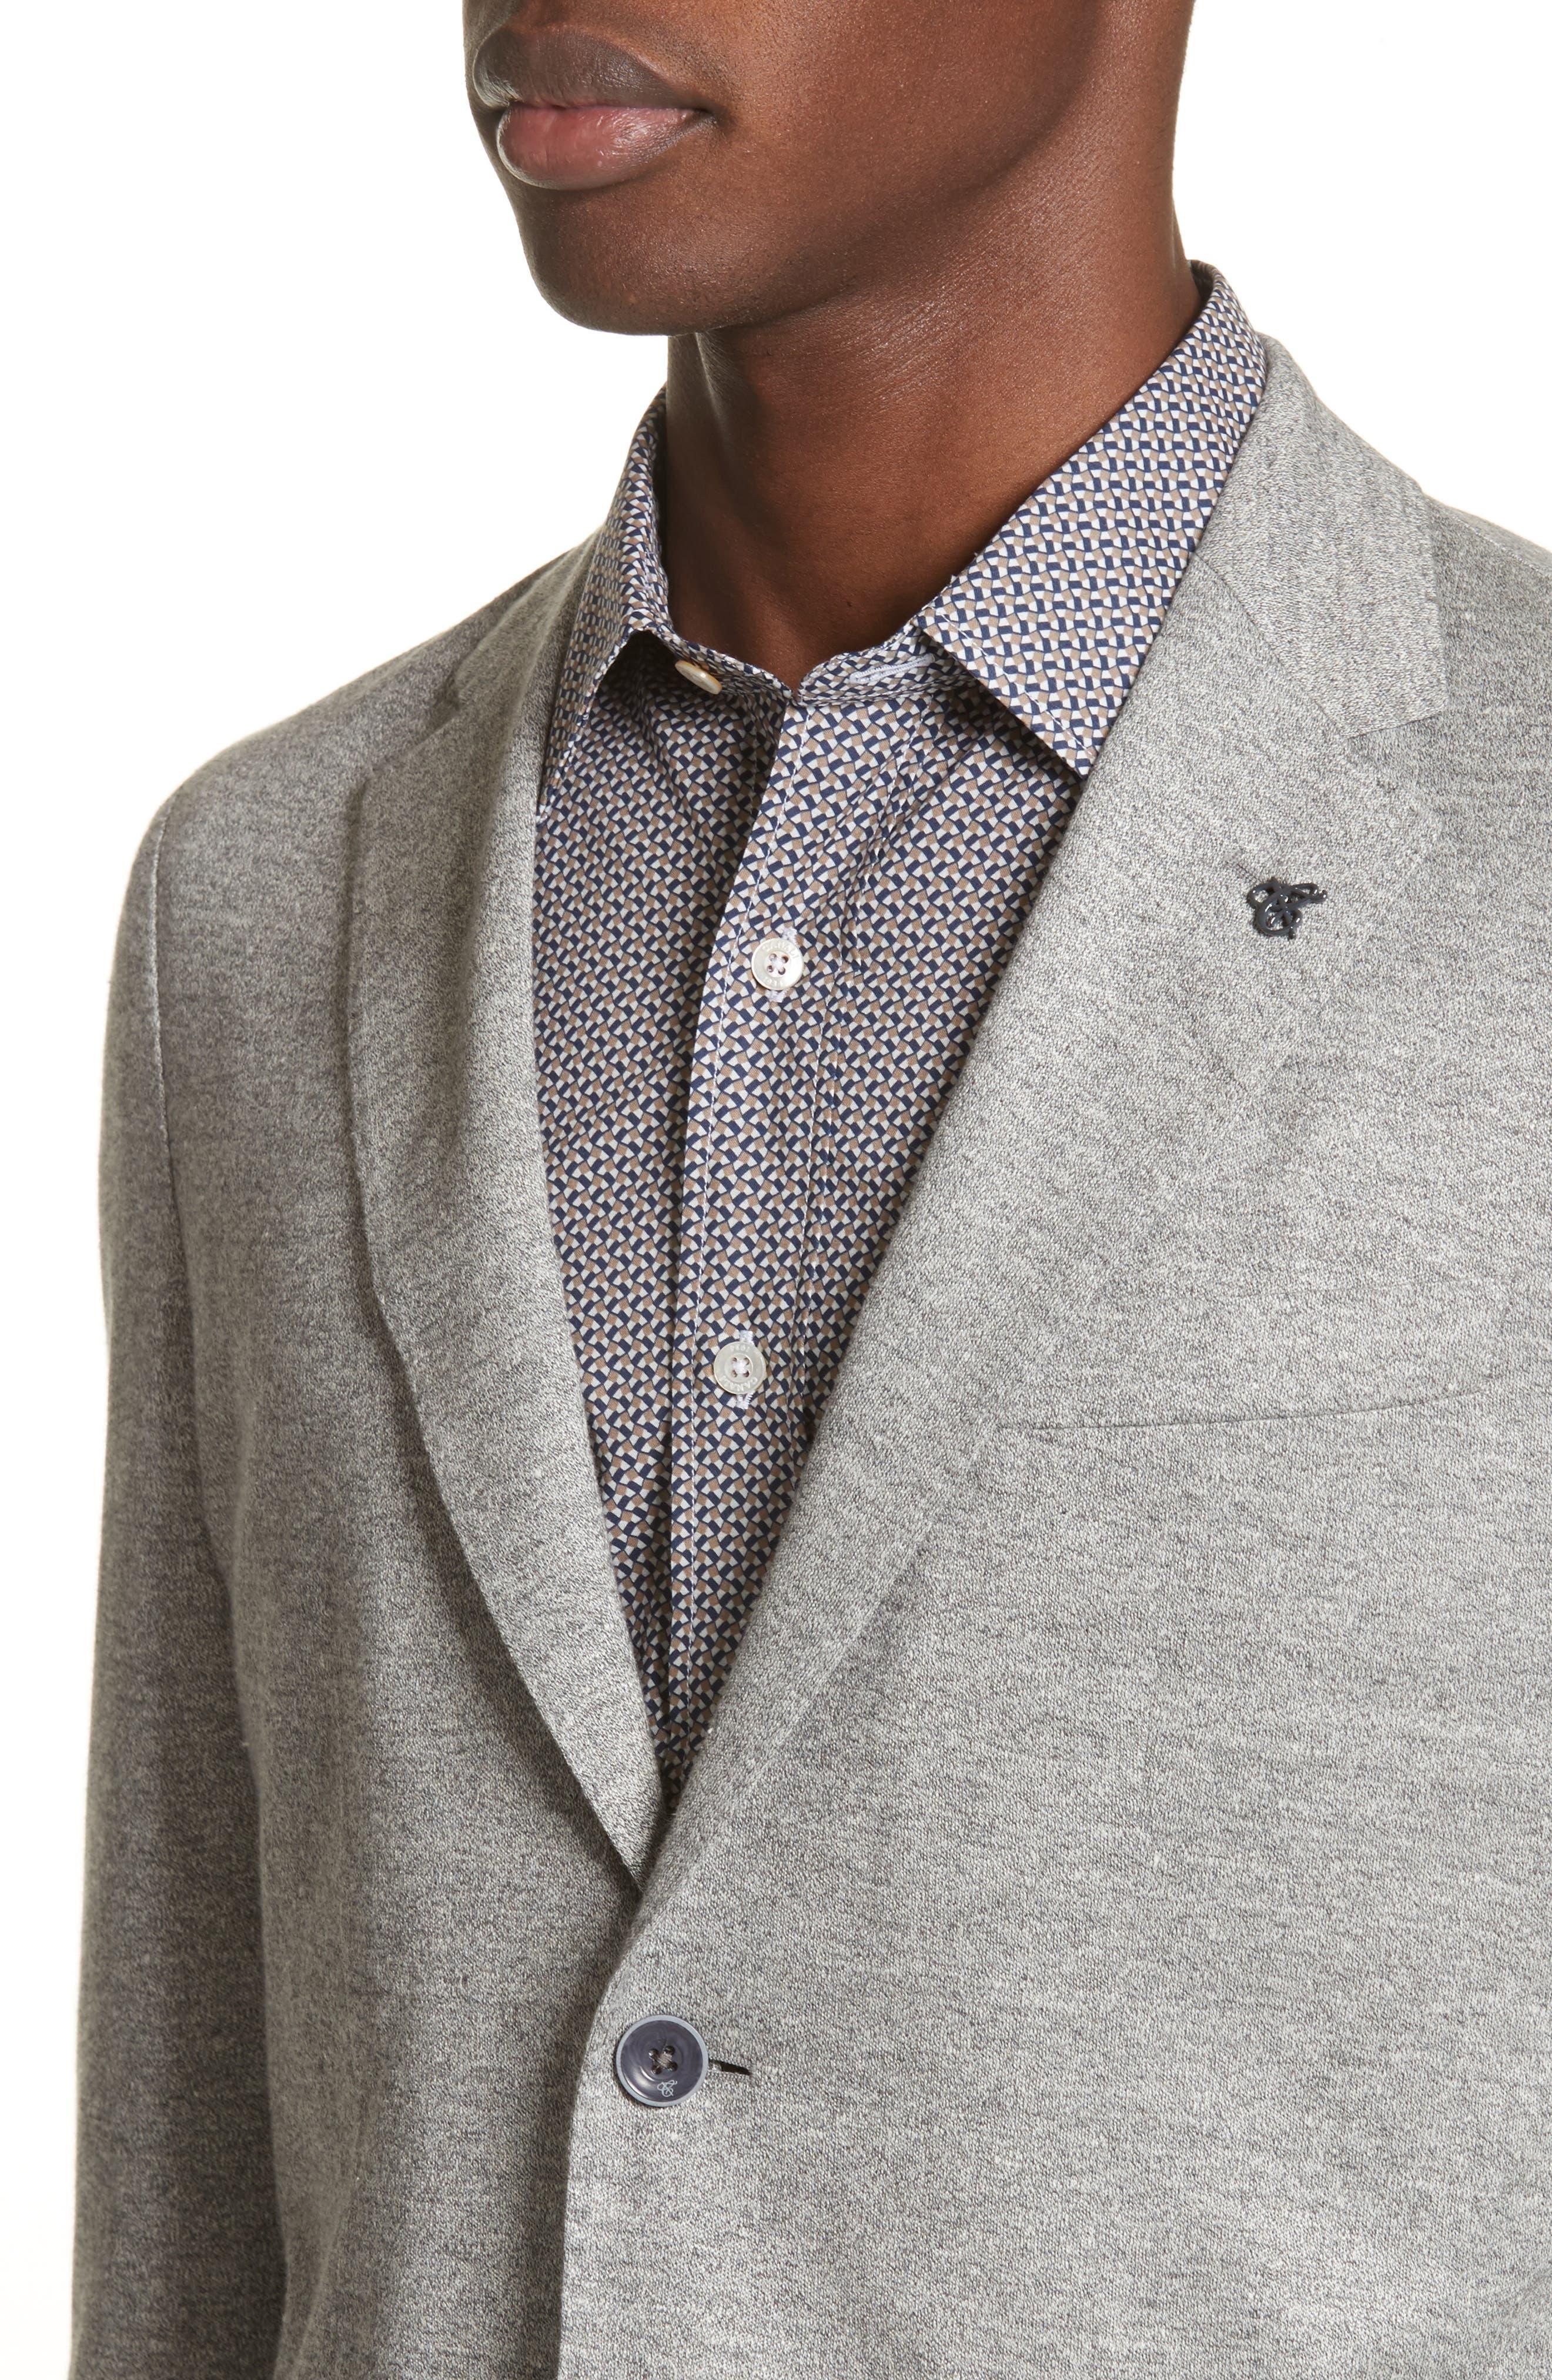 Trim Fit Washed Jersey Jacket,                             Alternate thumbnail 4, color,                             Light Grey